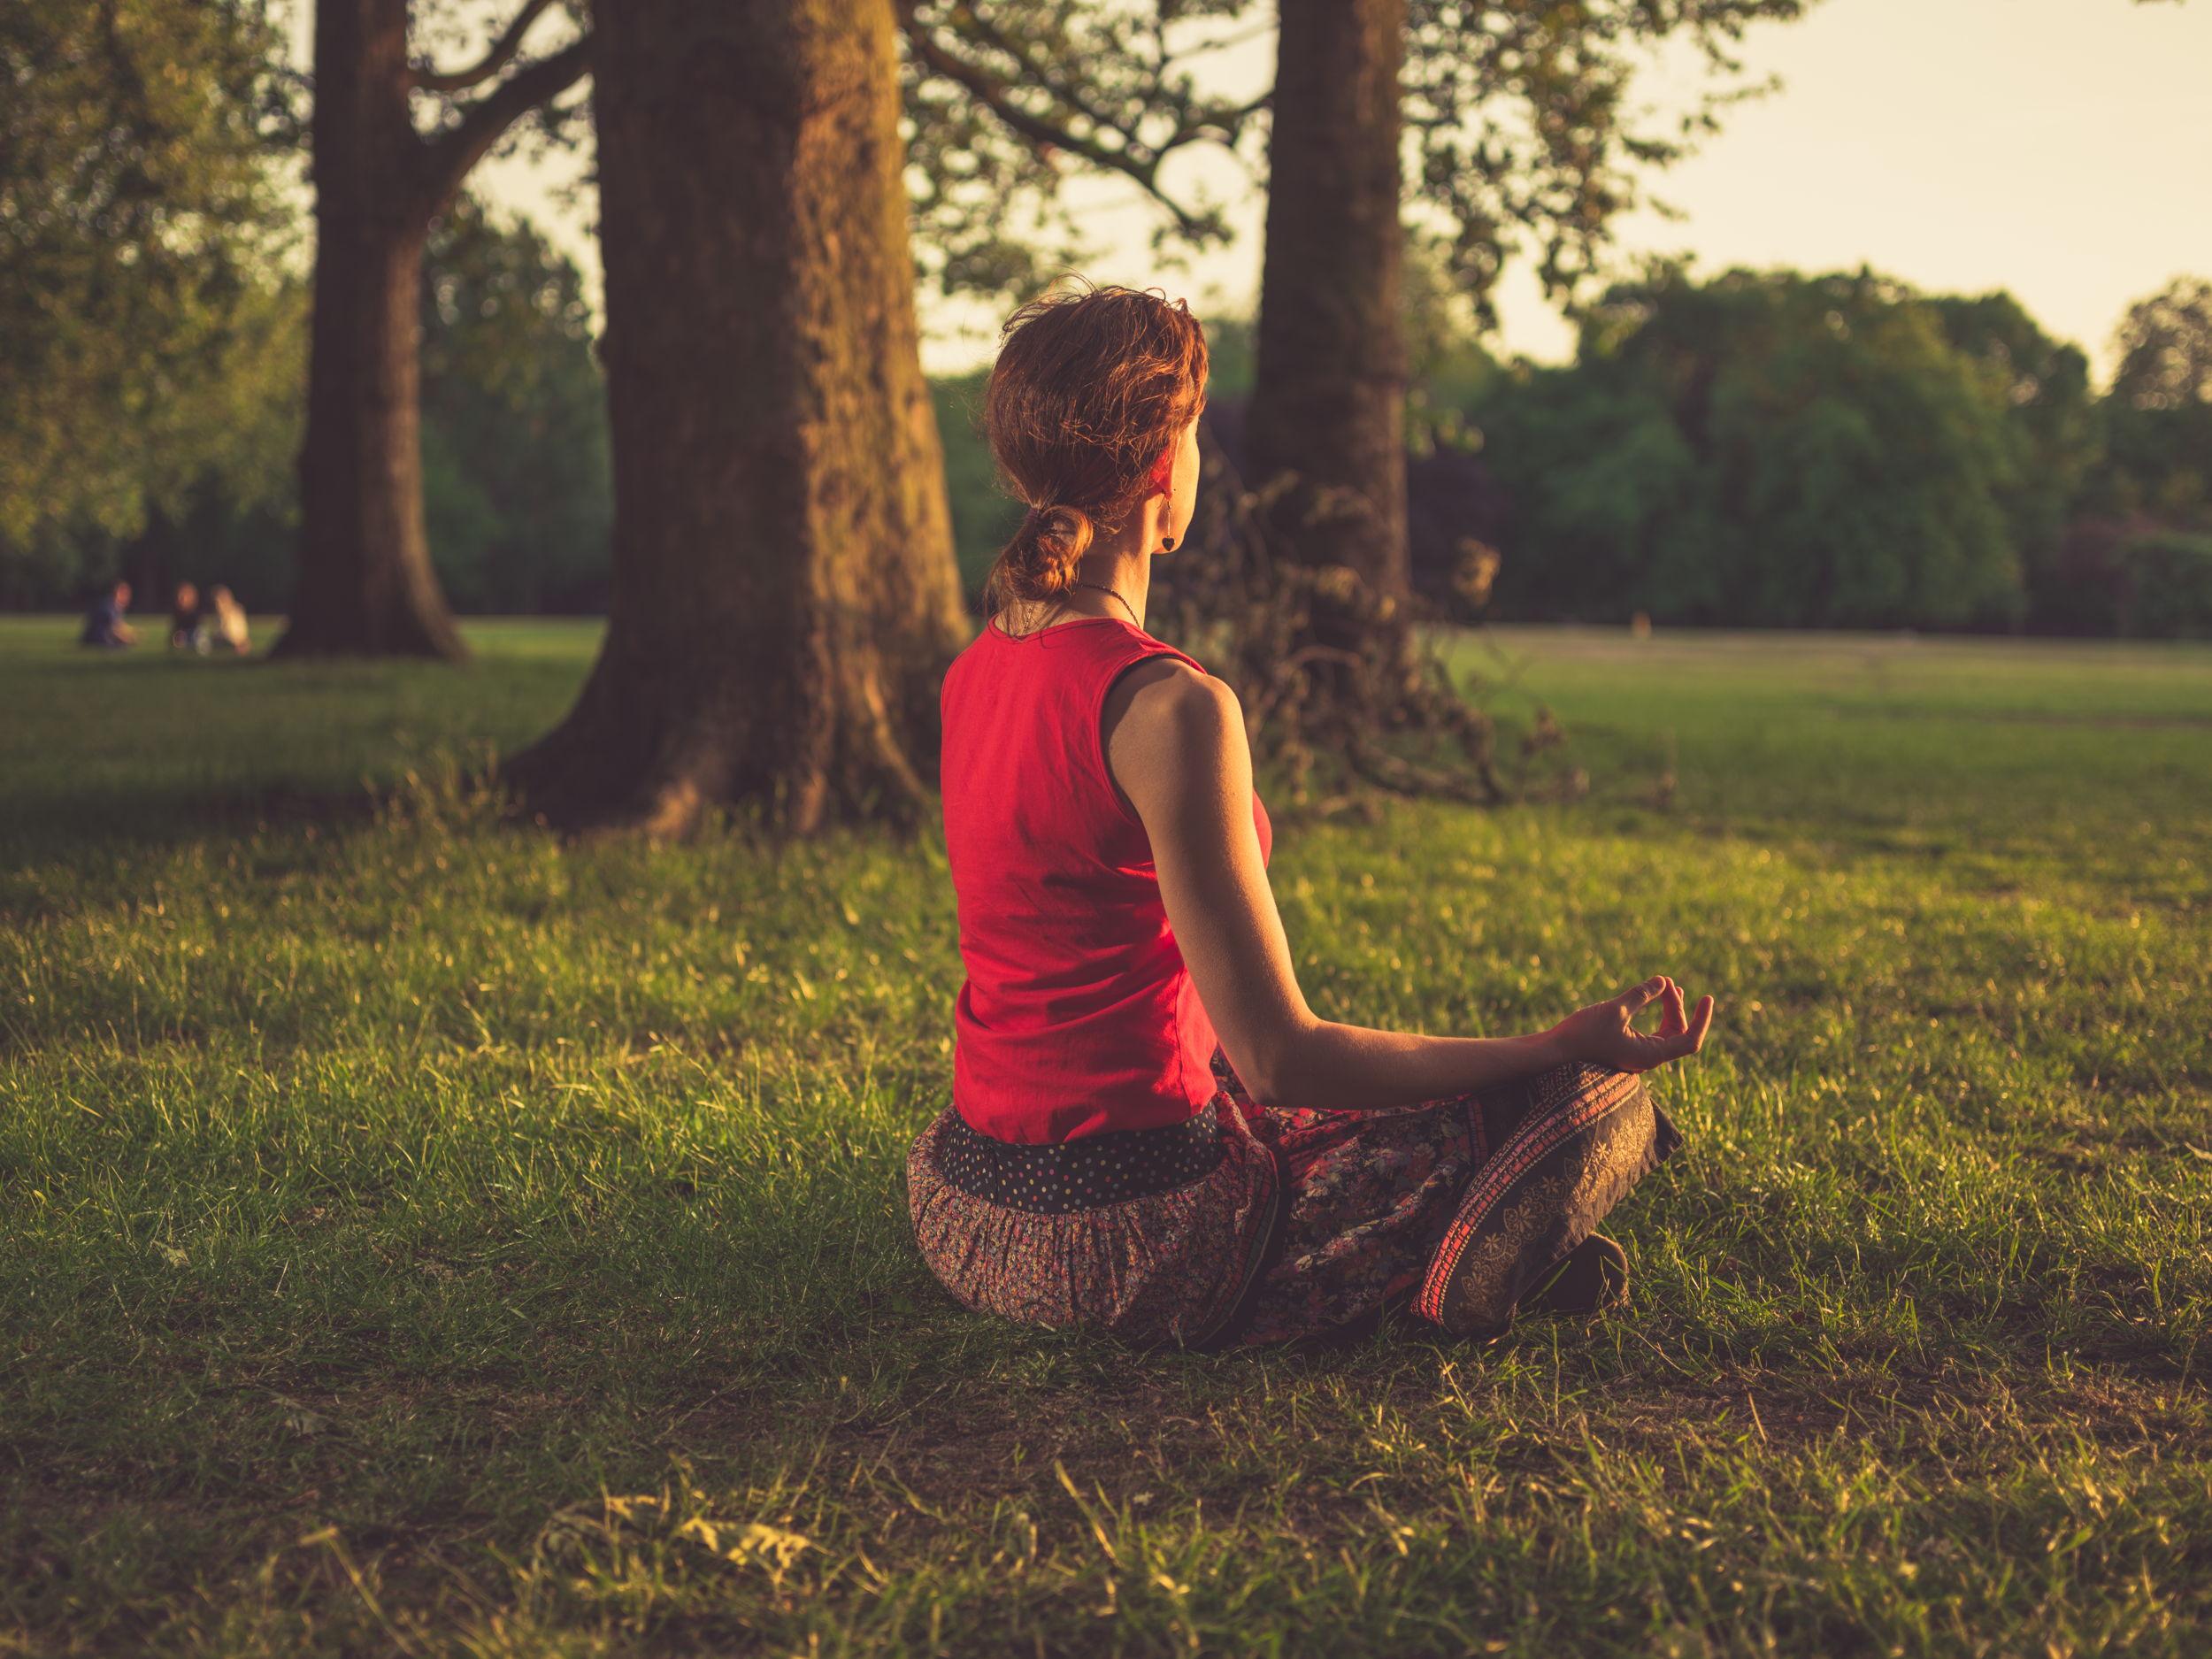 meditation music l guided meditation l mindfulness meditation l benefits of meditation